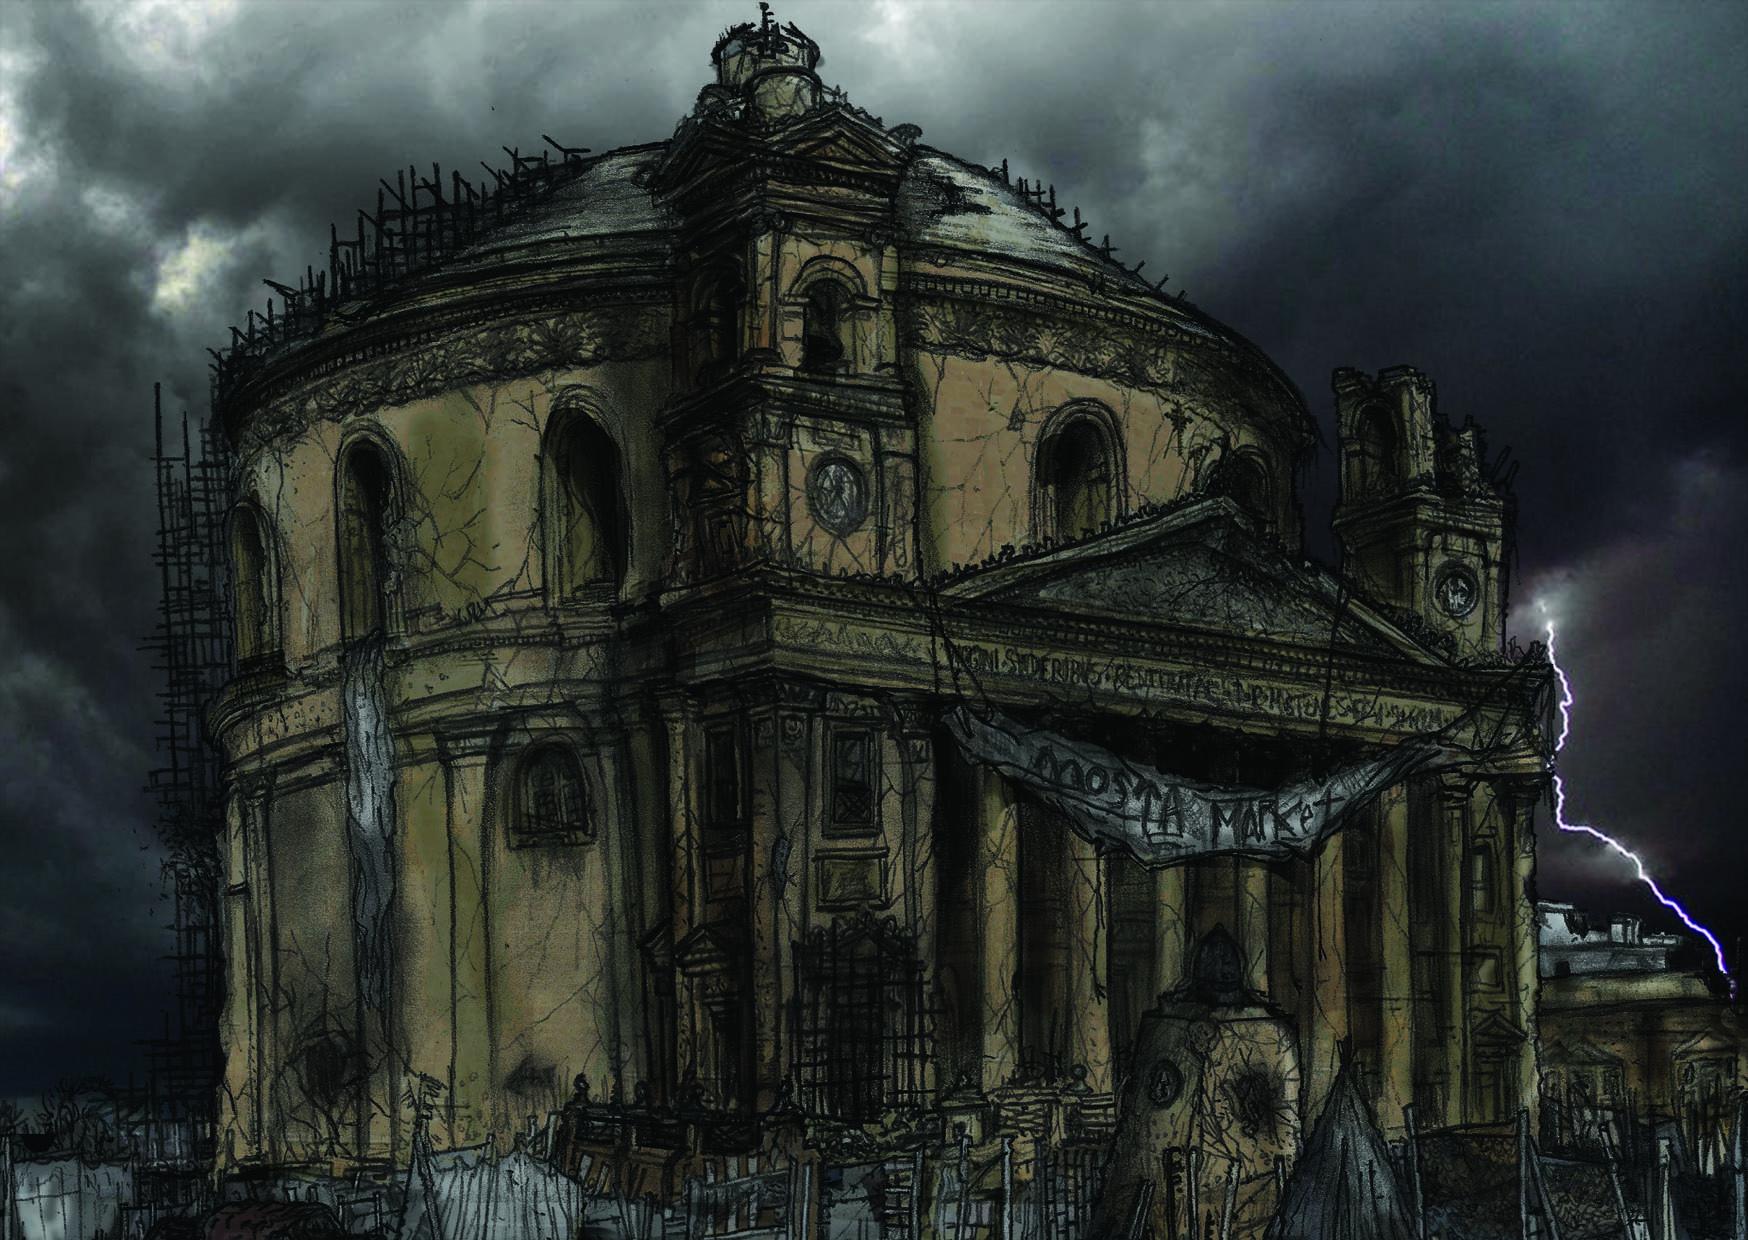 Mosta Dome Market II